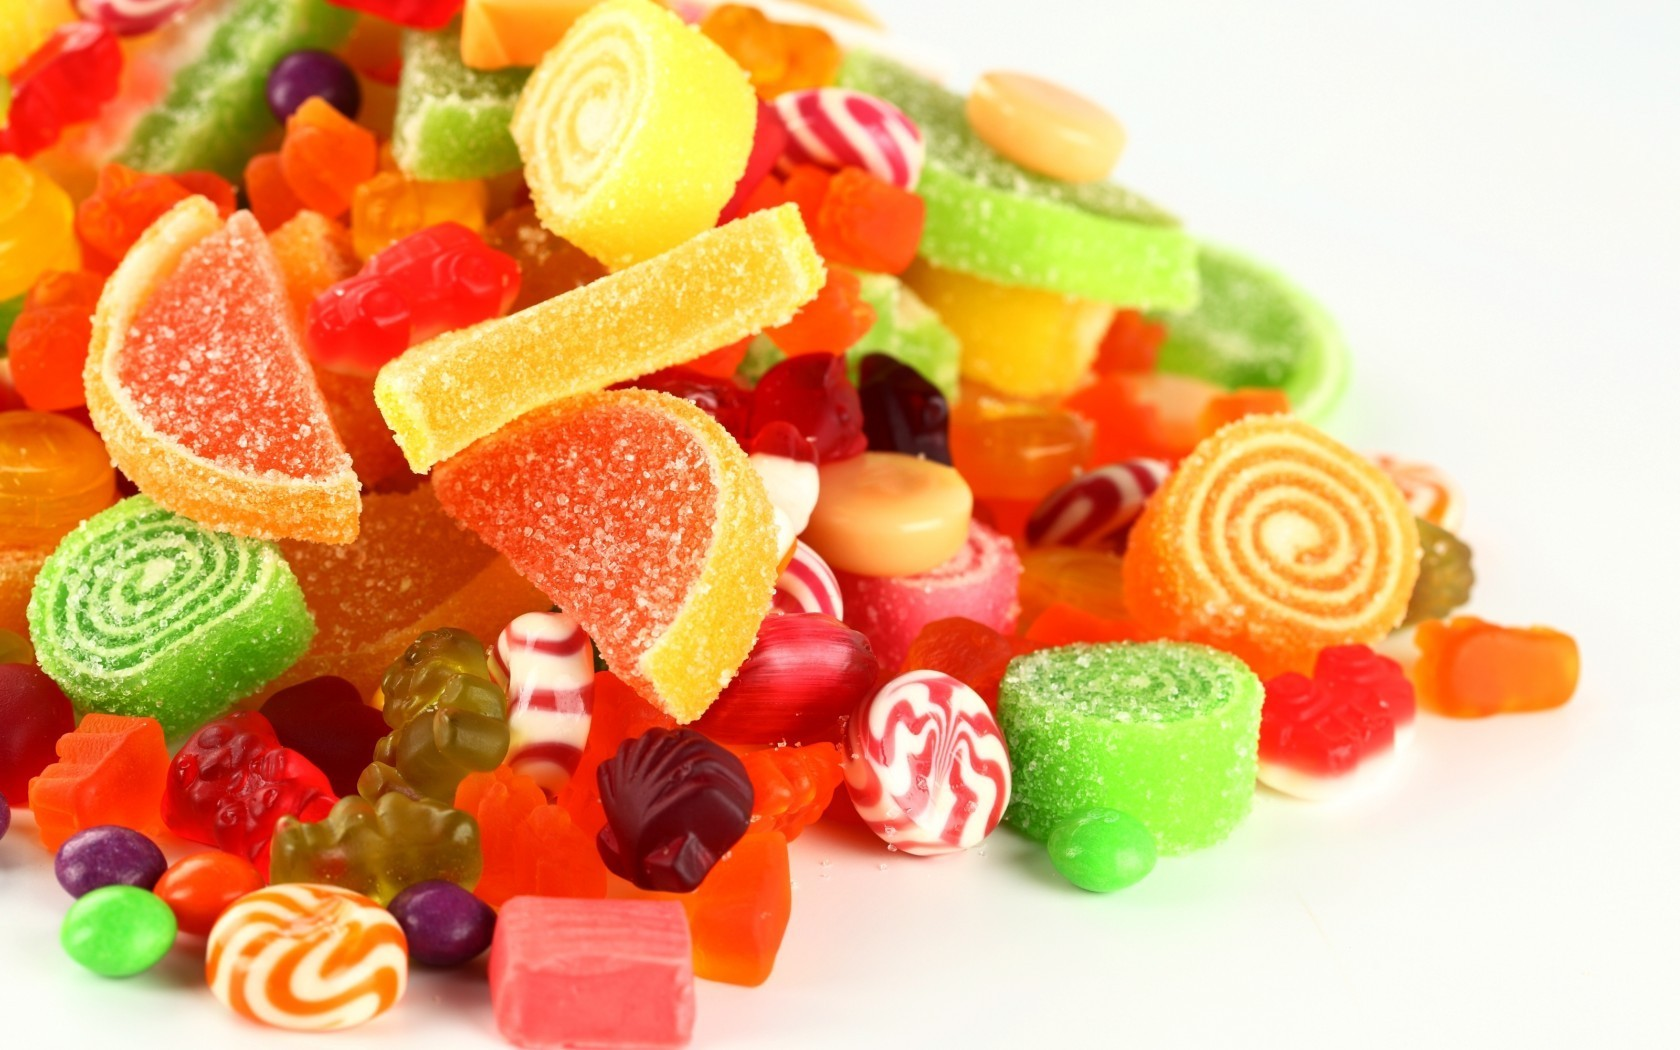 мармелад при повышенном холестерине